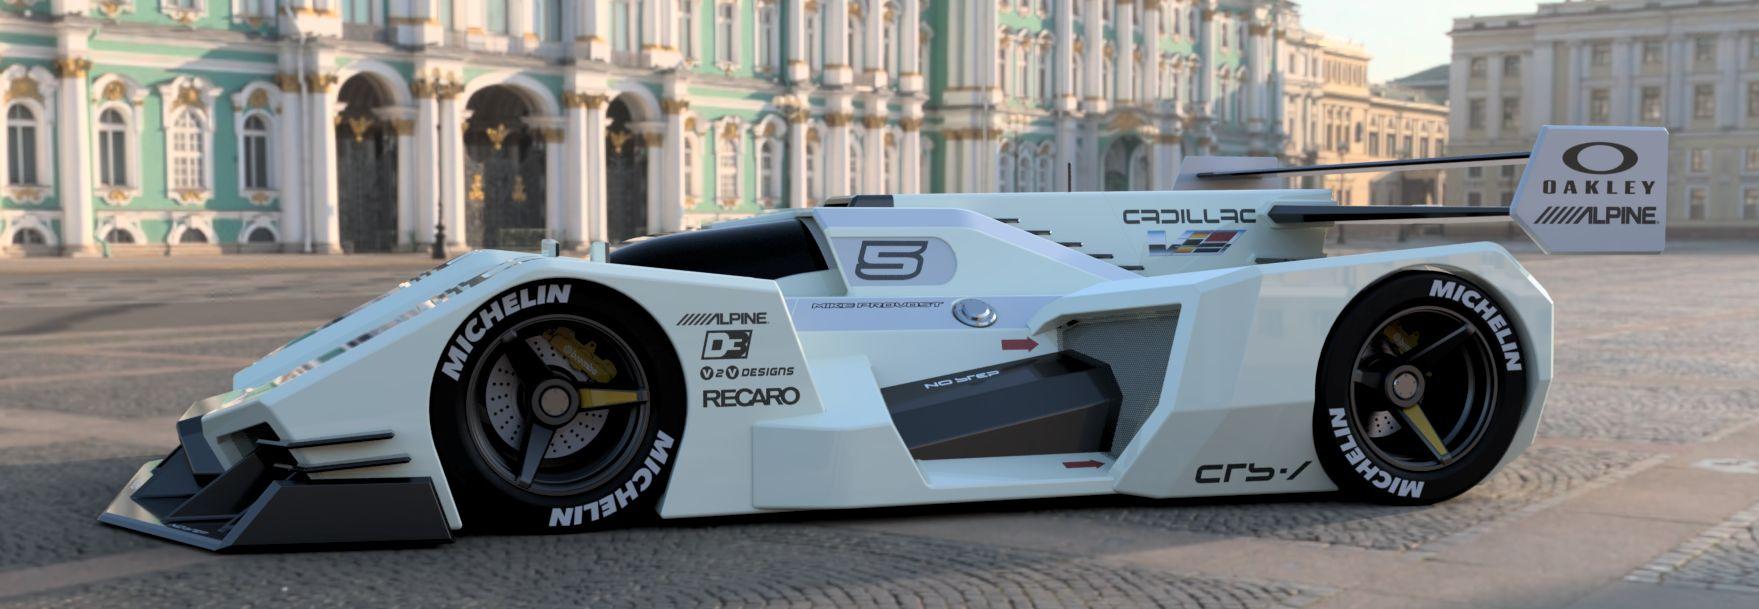 Formula-9-3500-3500